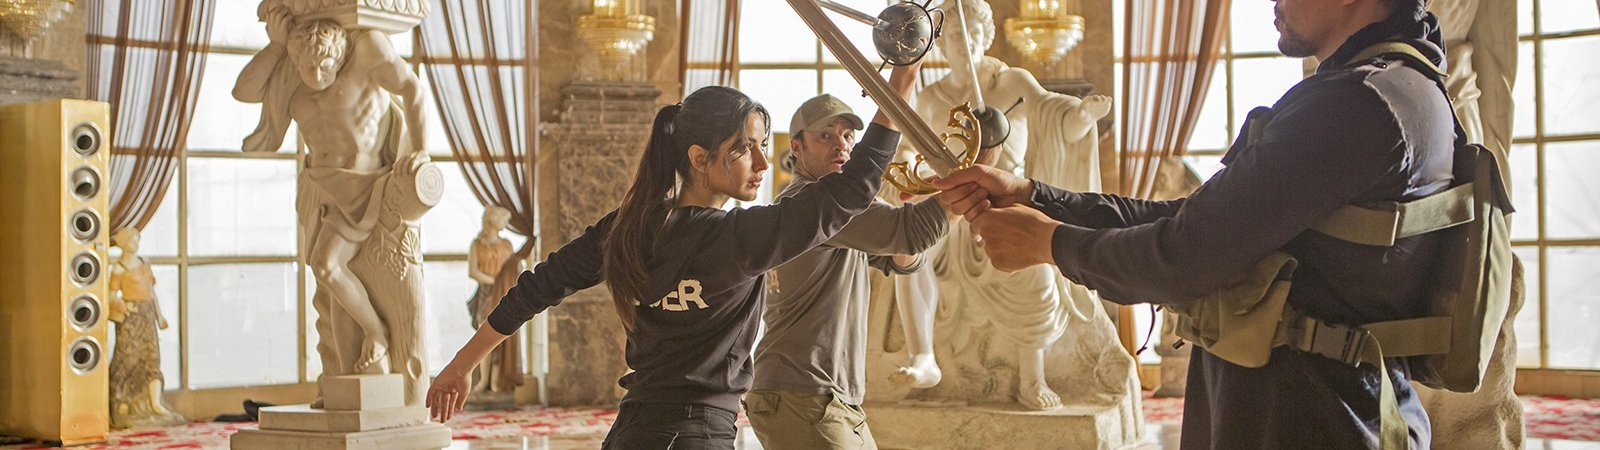 Photo dernier film Salman Khan